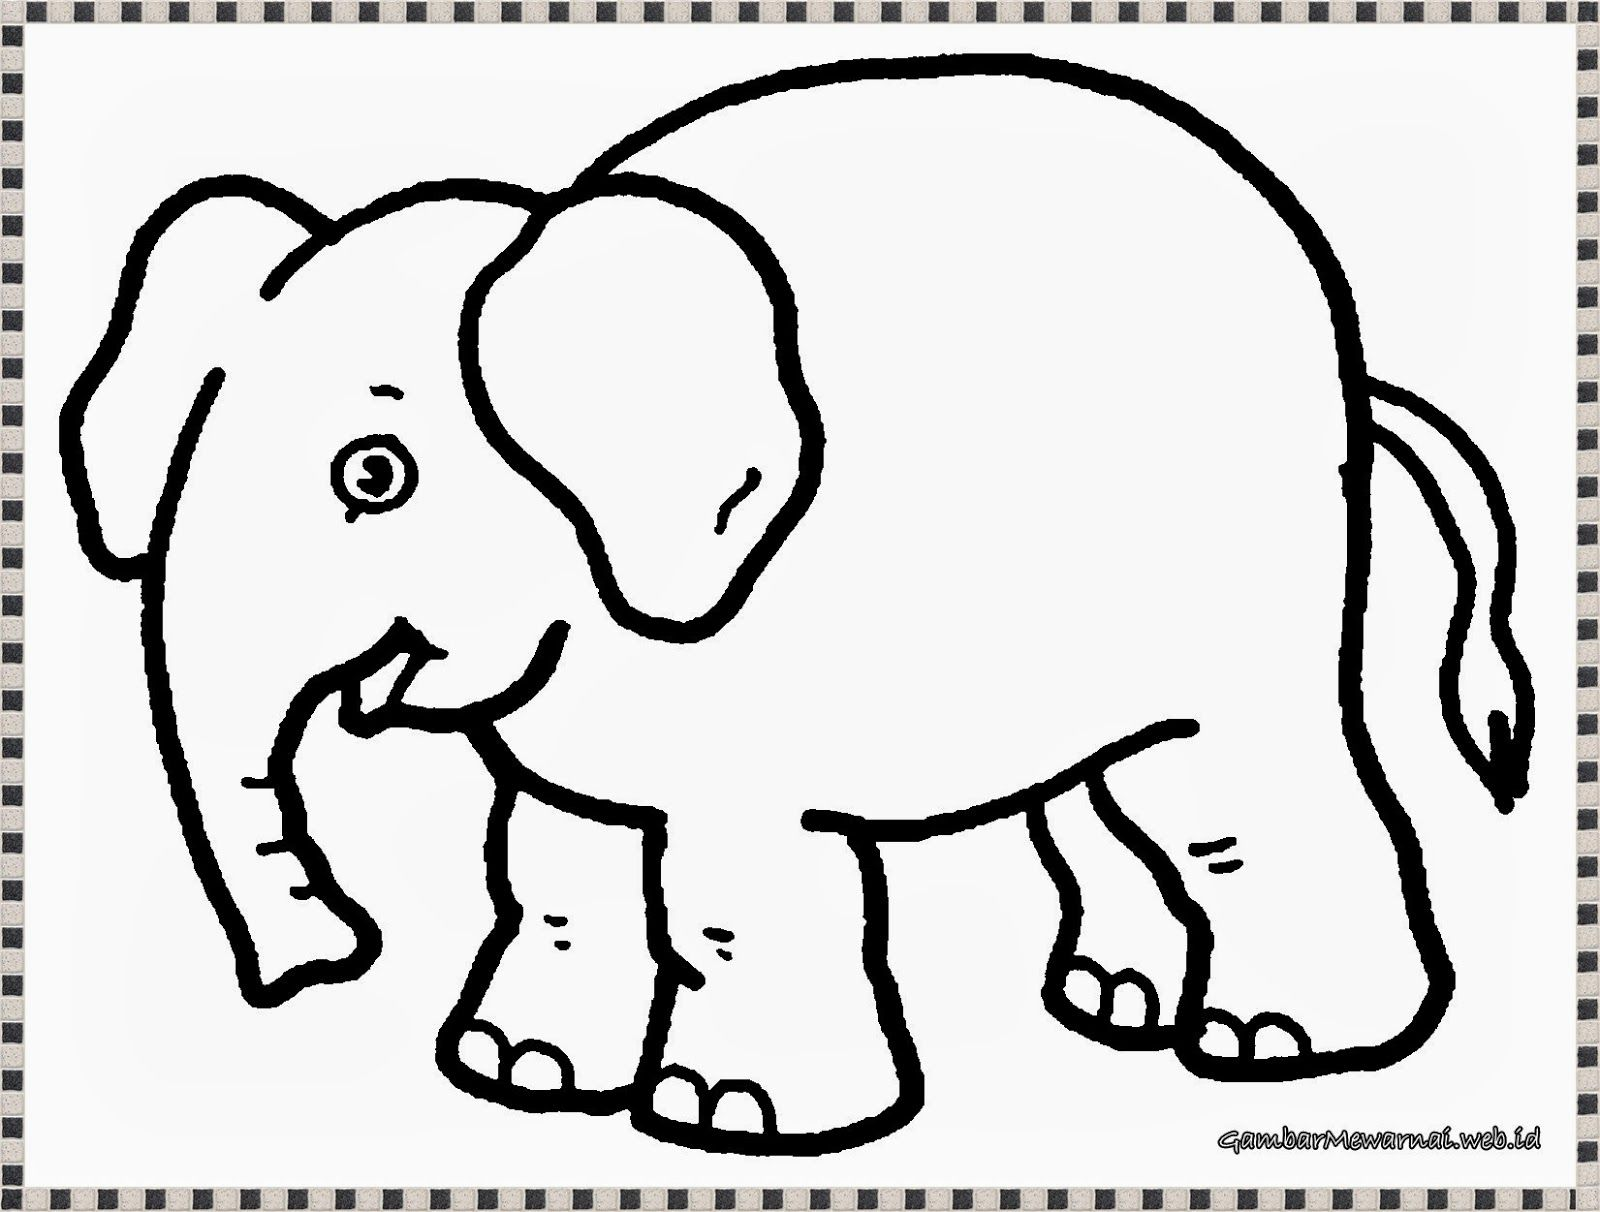 Mewarnai Gambar Gajah Dengan Gambar Gajah Buku Mewarnai Cara